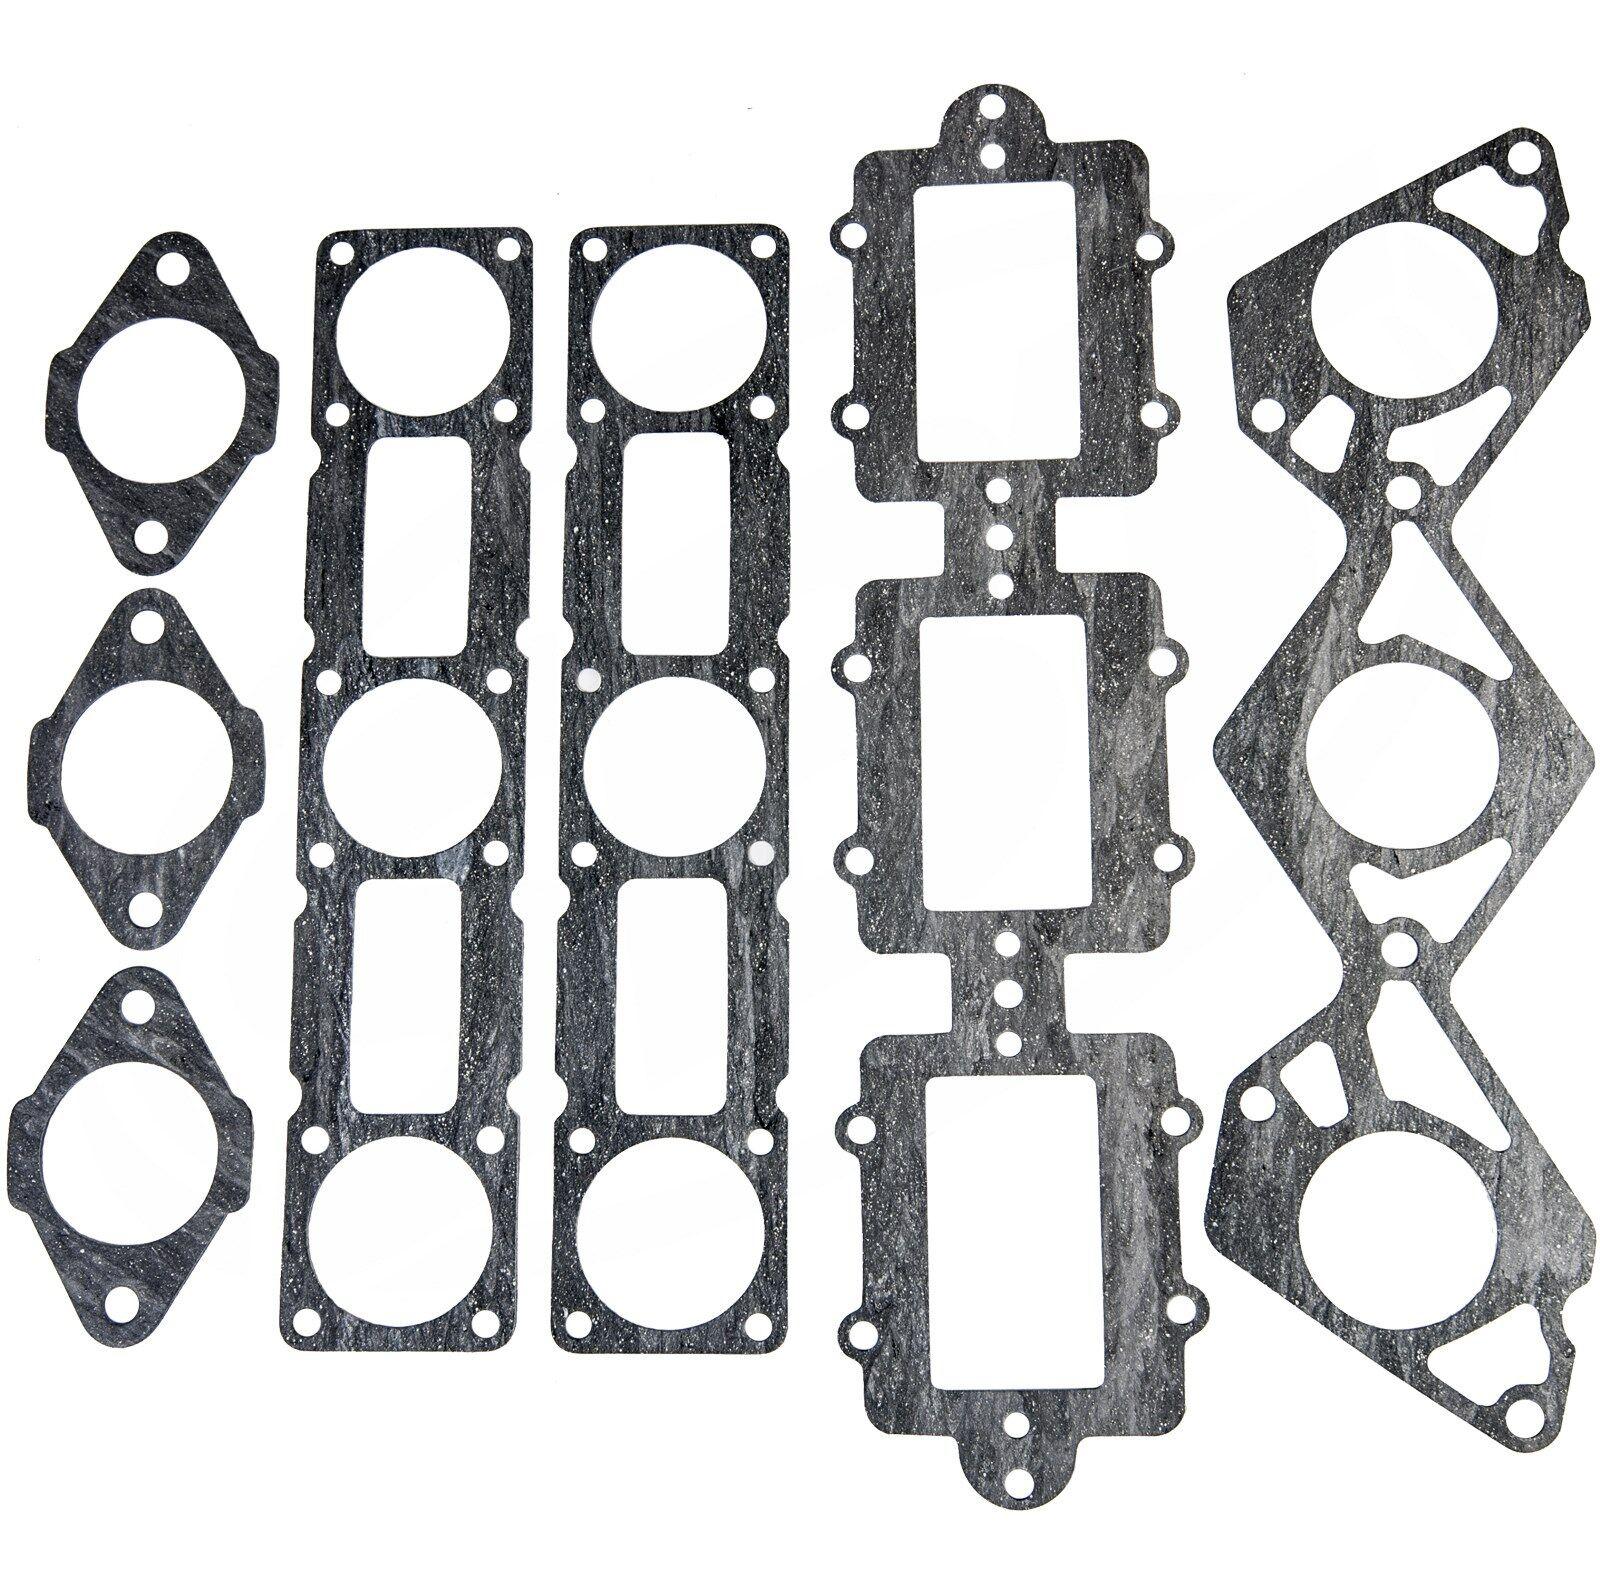 Yamaha Intake Gasket Kit 1200 Non PV LS2000 LX210 AR210